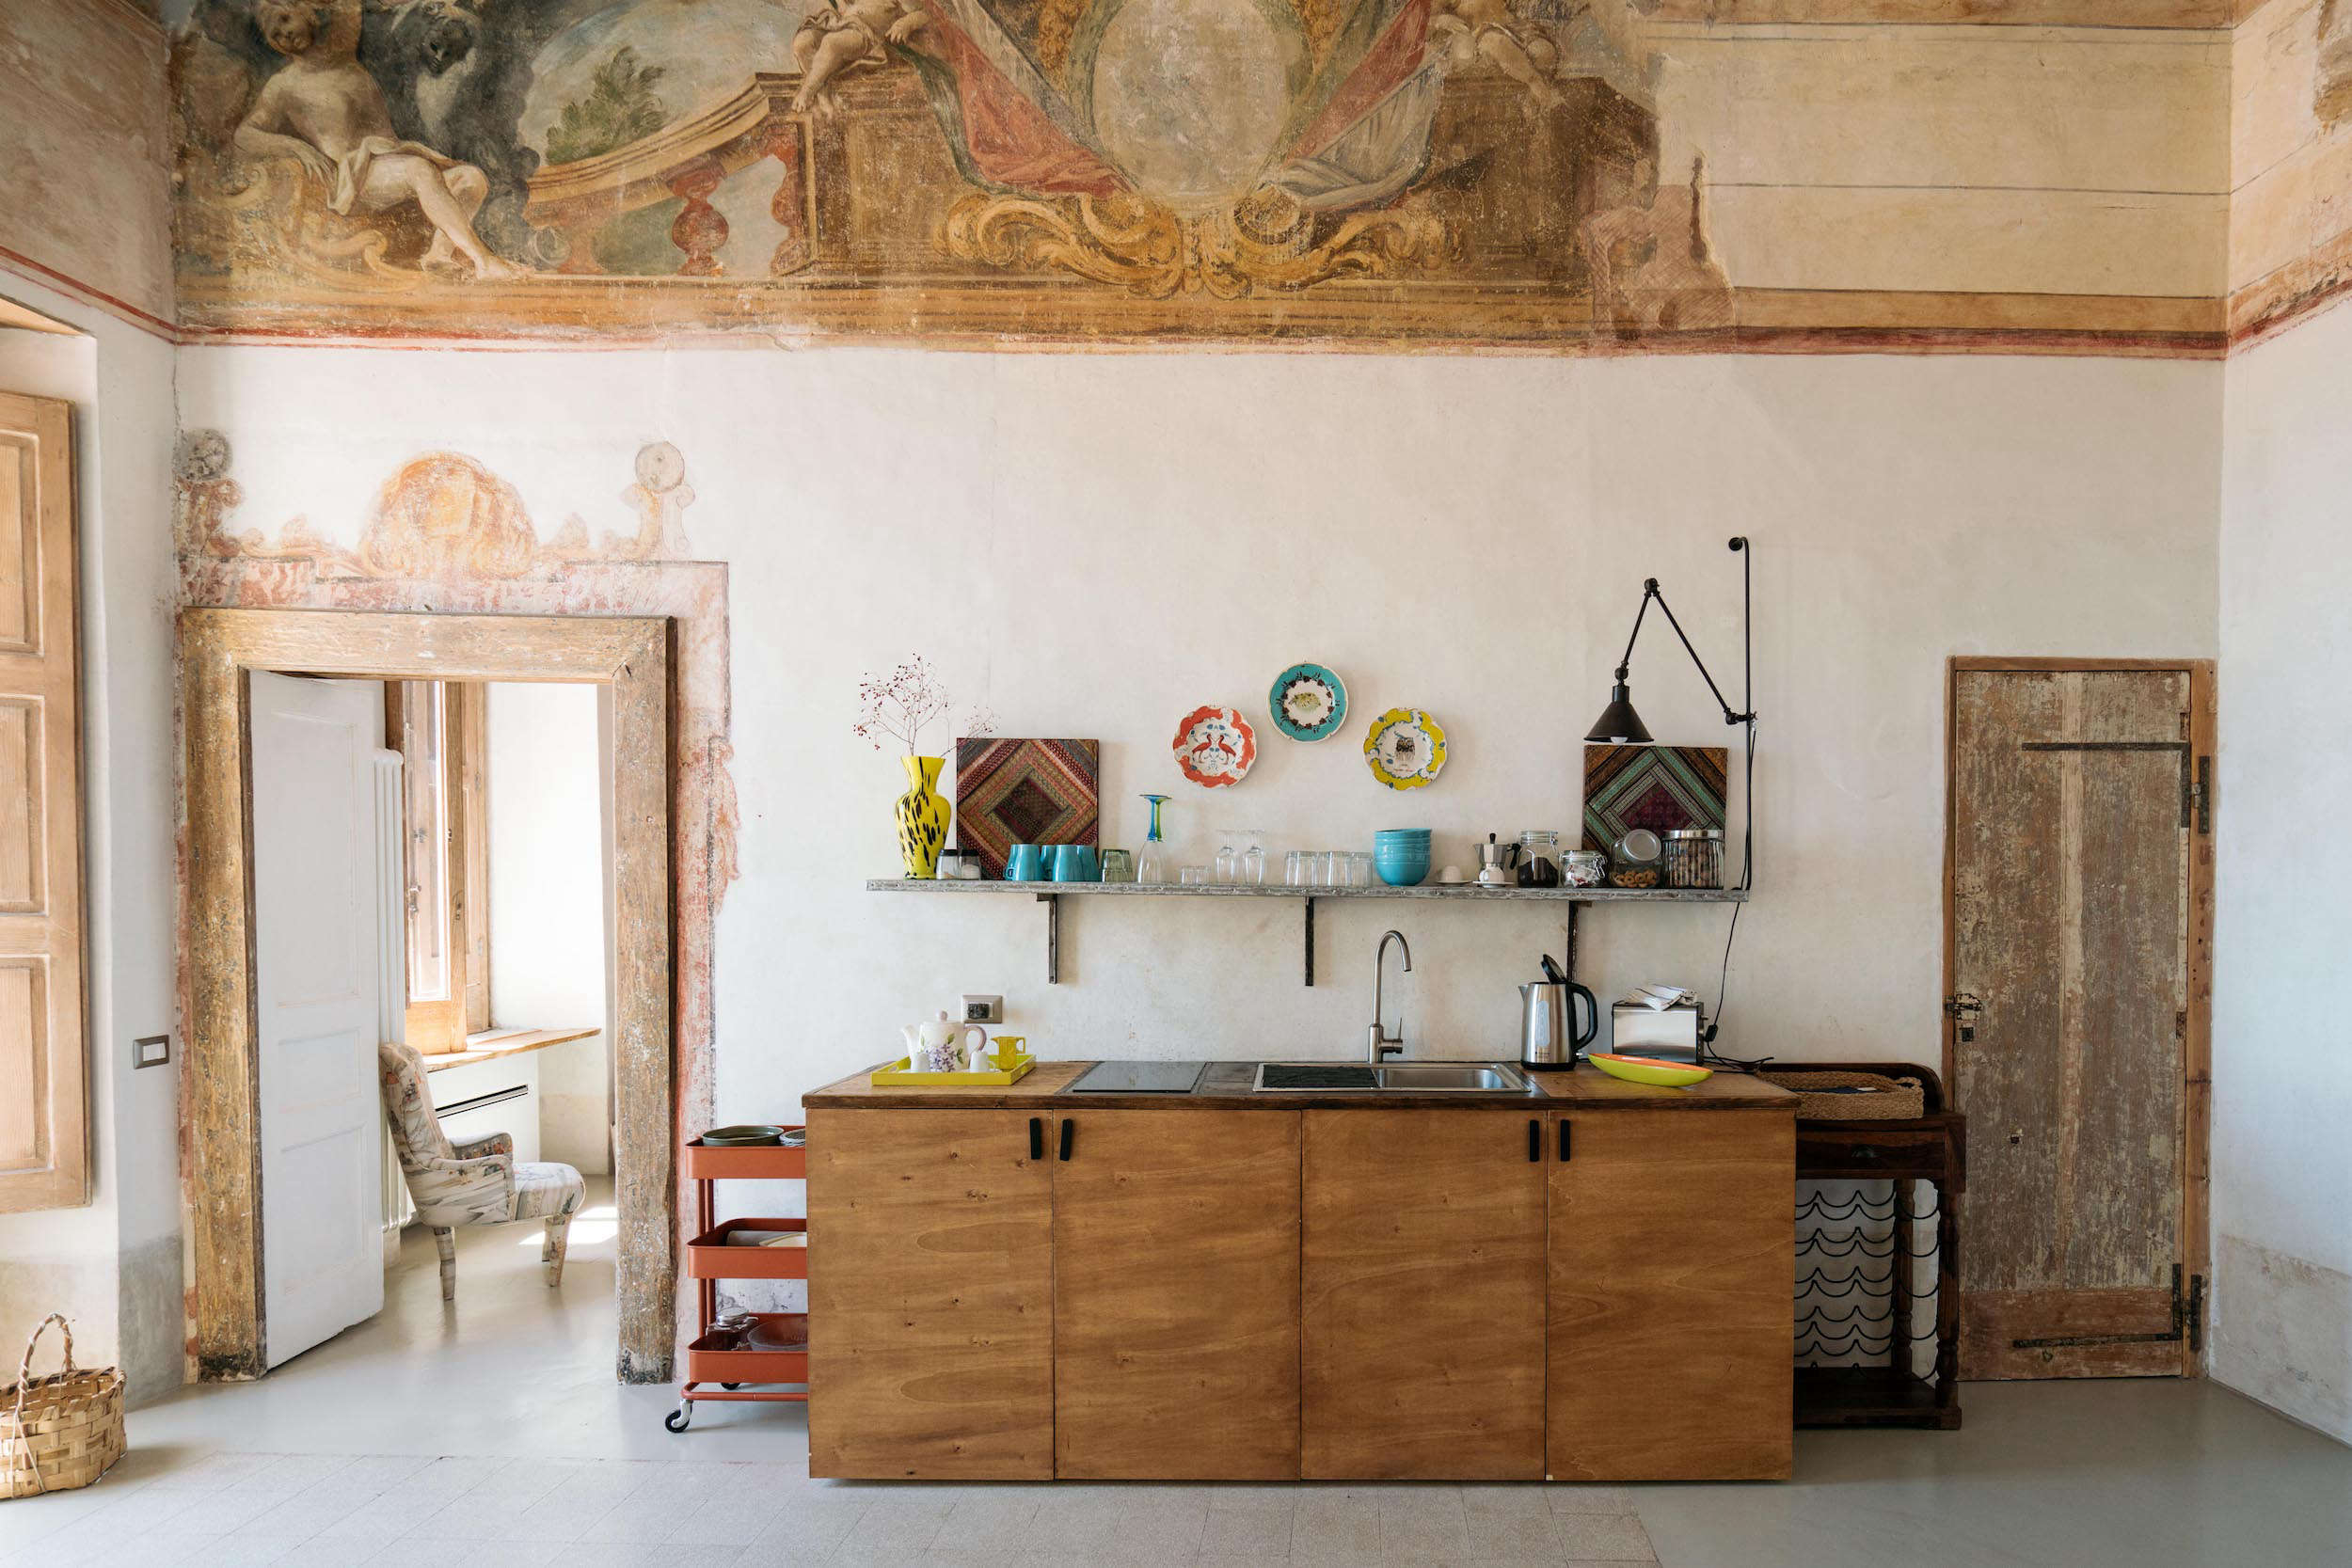 A Romantic Monastery-Turned-Vacation Rental on the Amalfi Coast